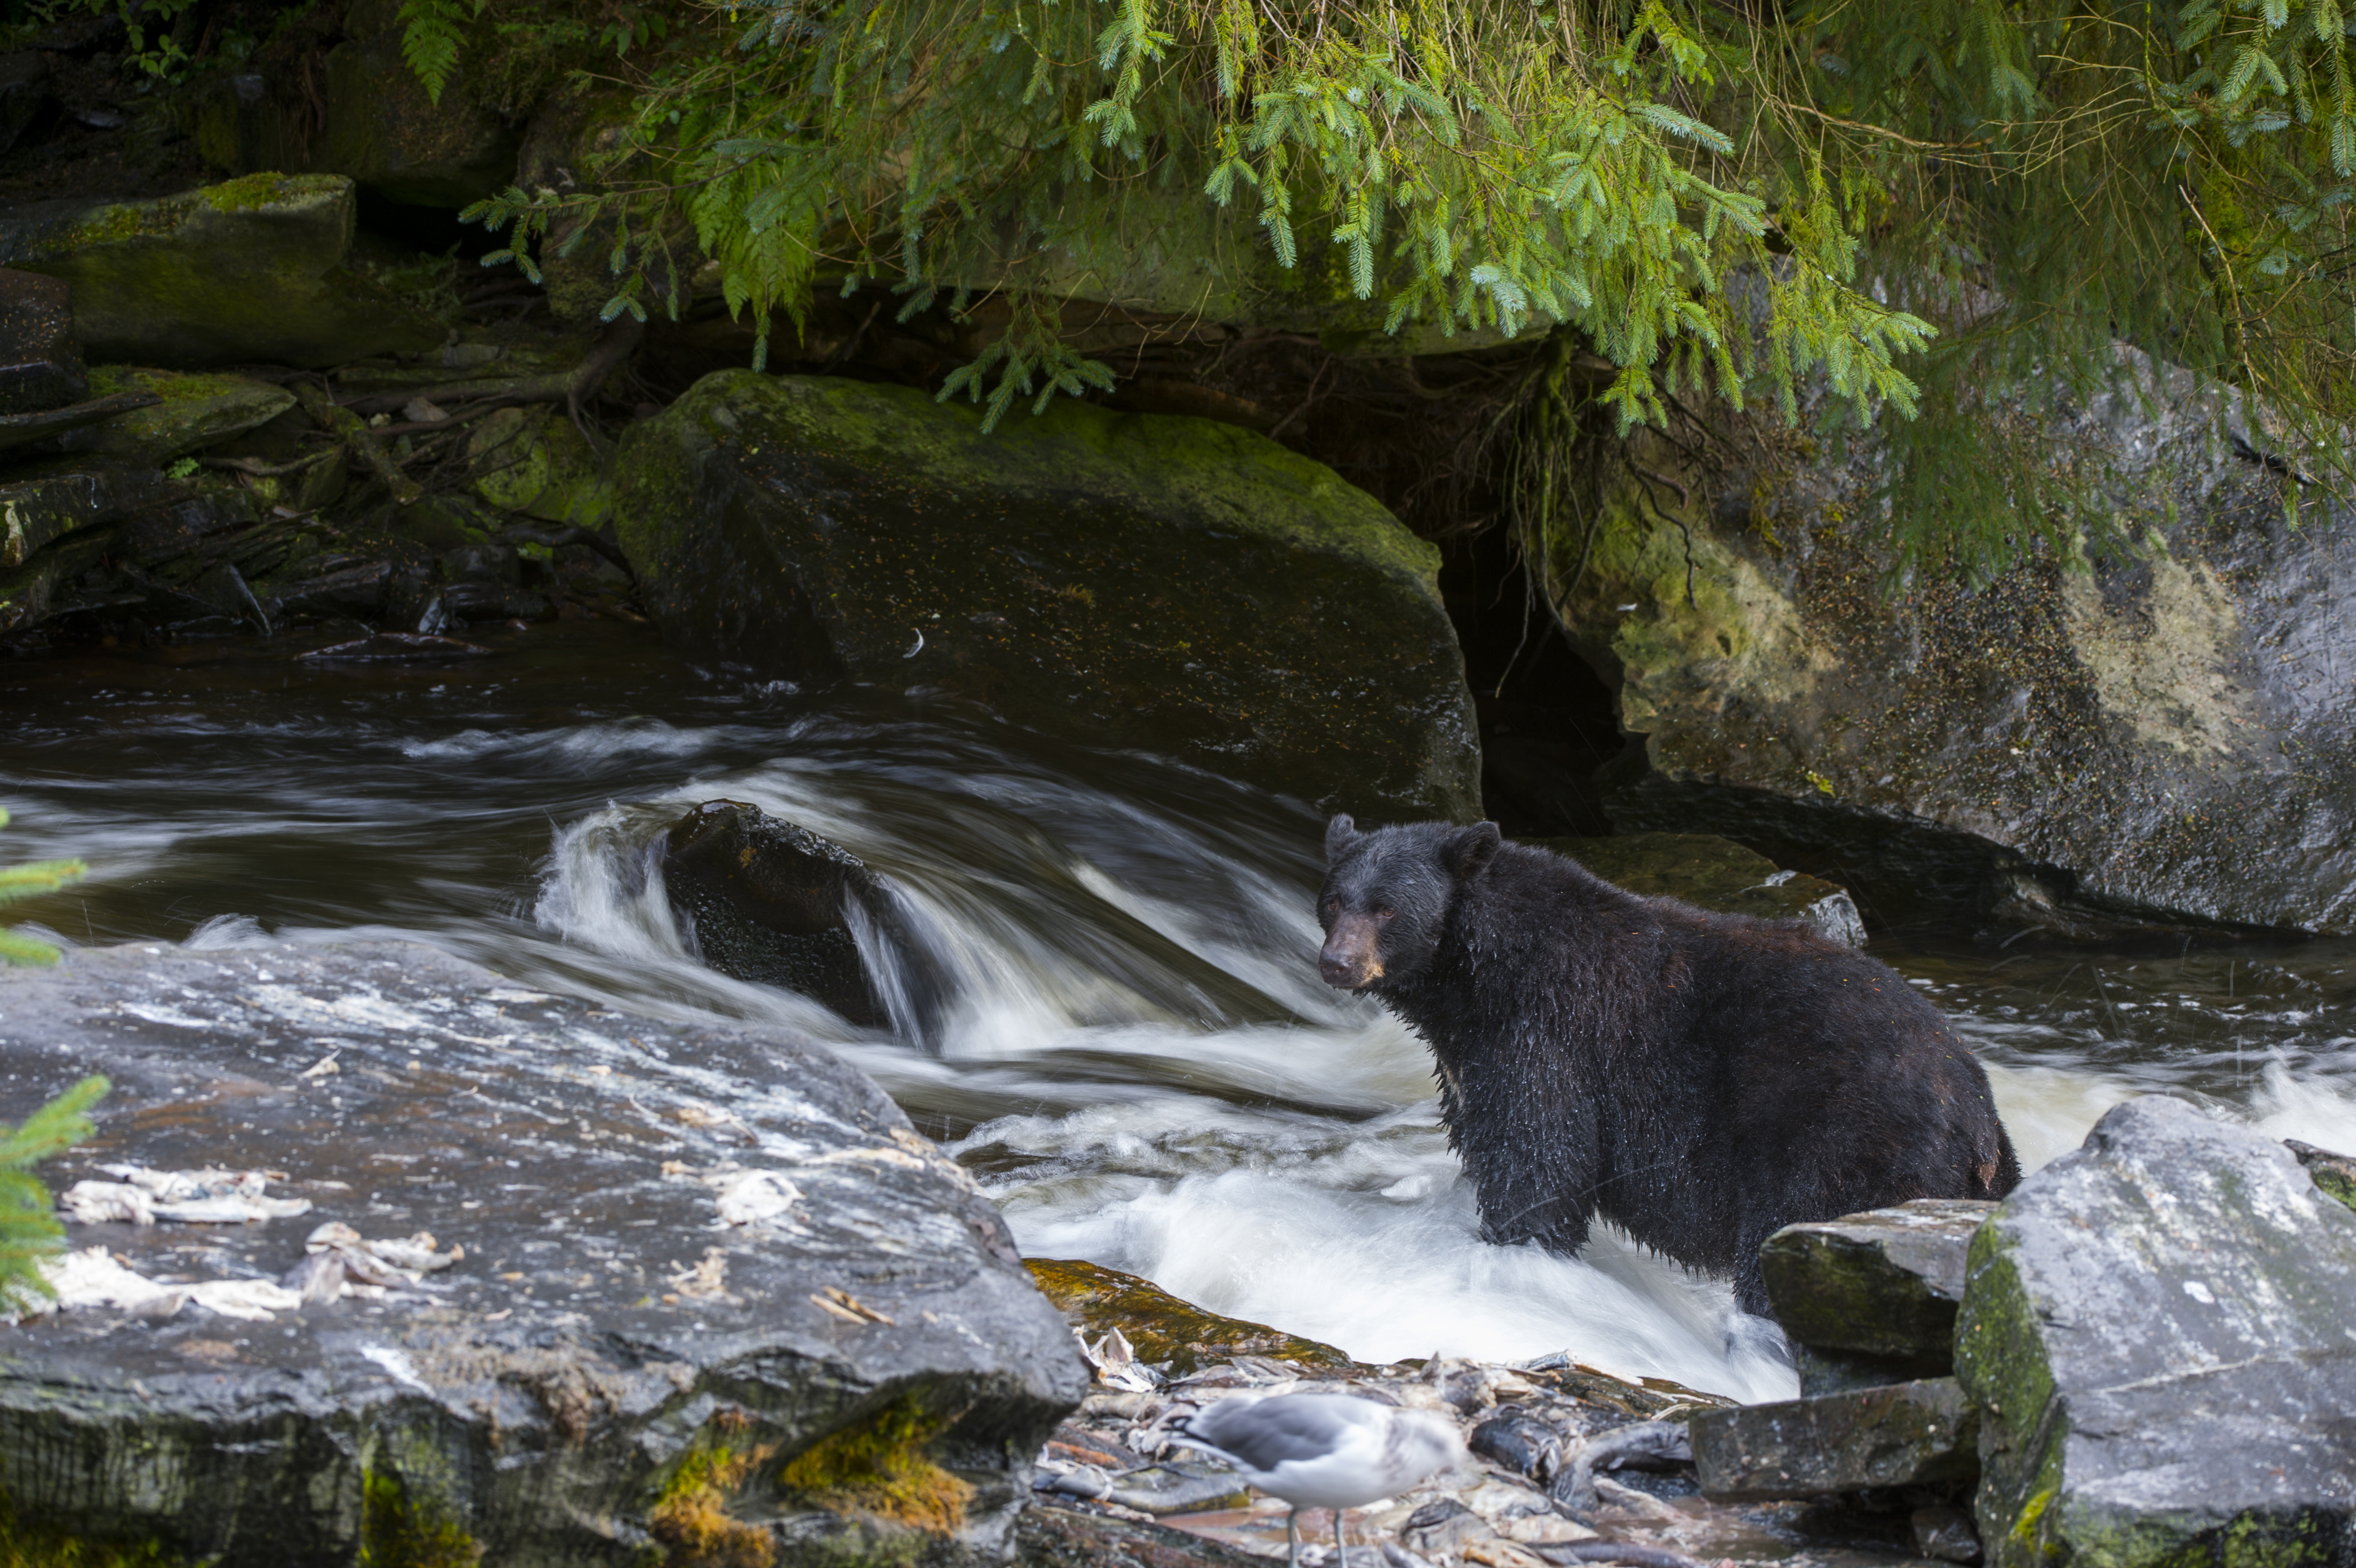 American black bear (Ursus americanus) looking for salmon at creek at Neets Bay fish hatchery, Behm Canal in Southeast Alaska near Ketchikan, USA.